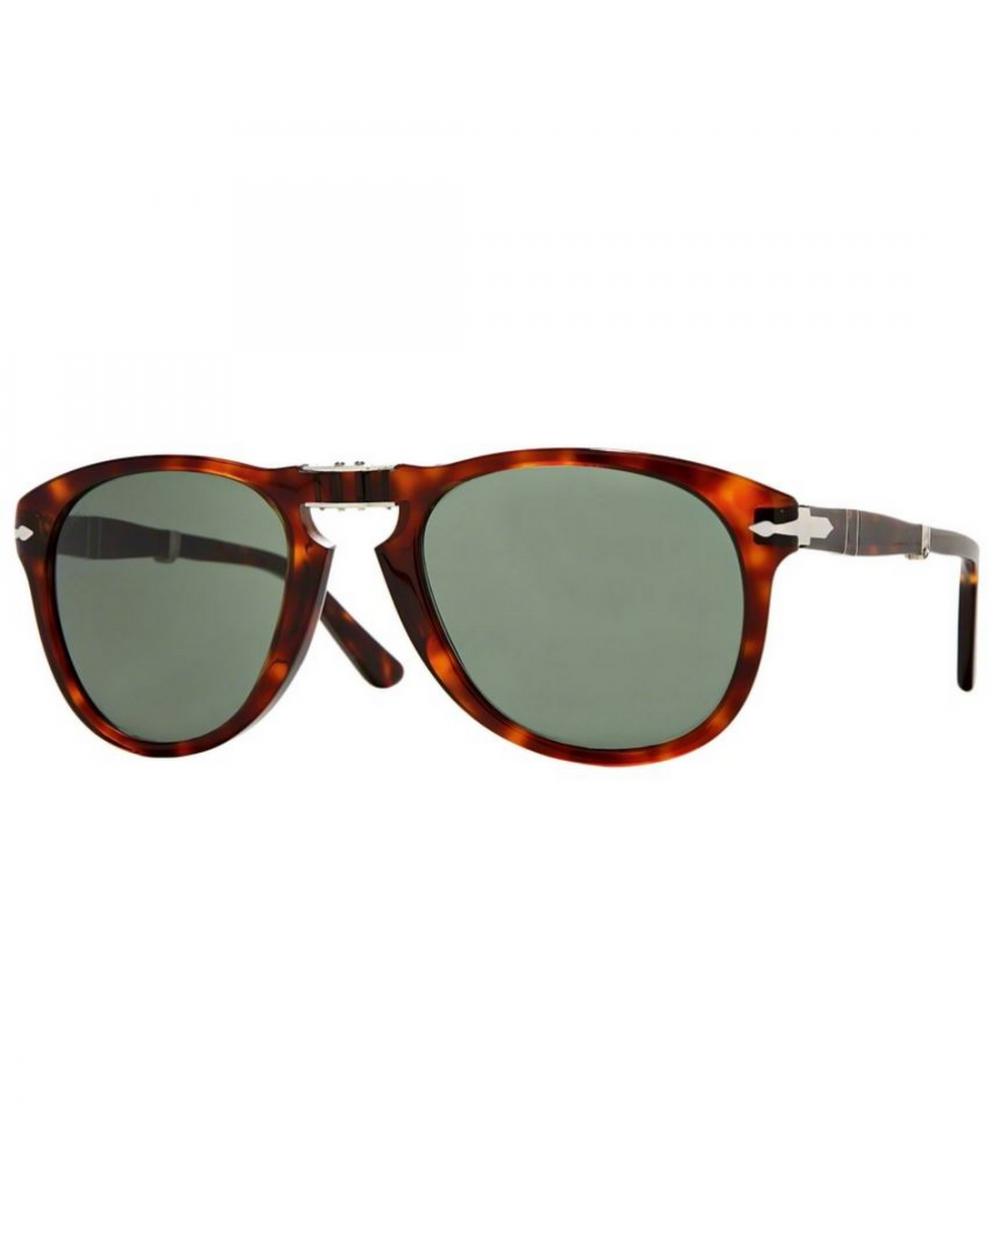 Sonnenbrille Persol original-verpackung garantie Italien